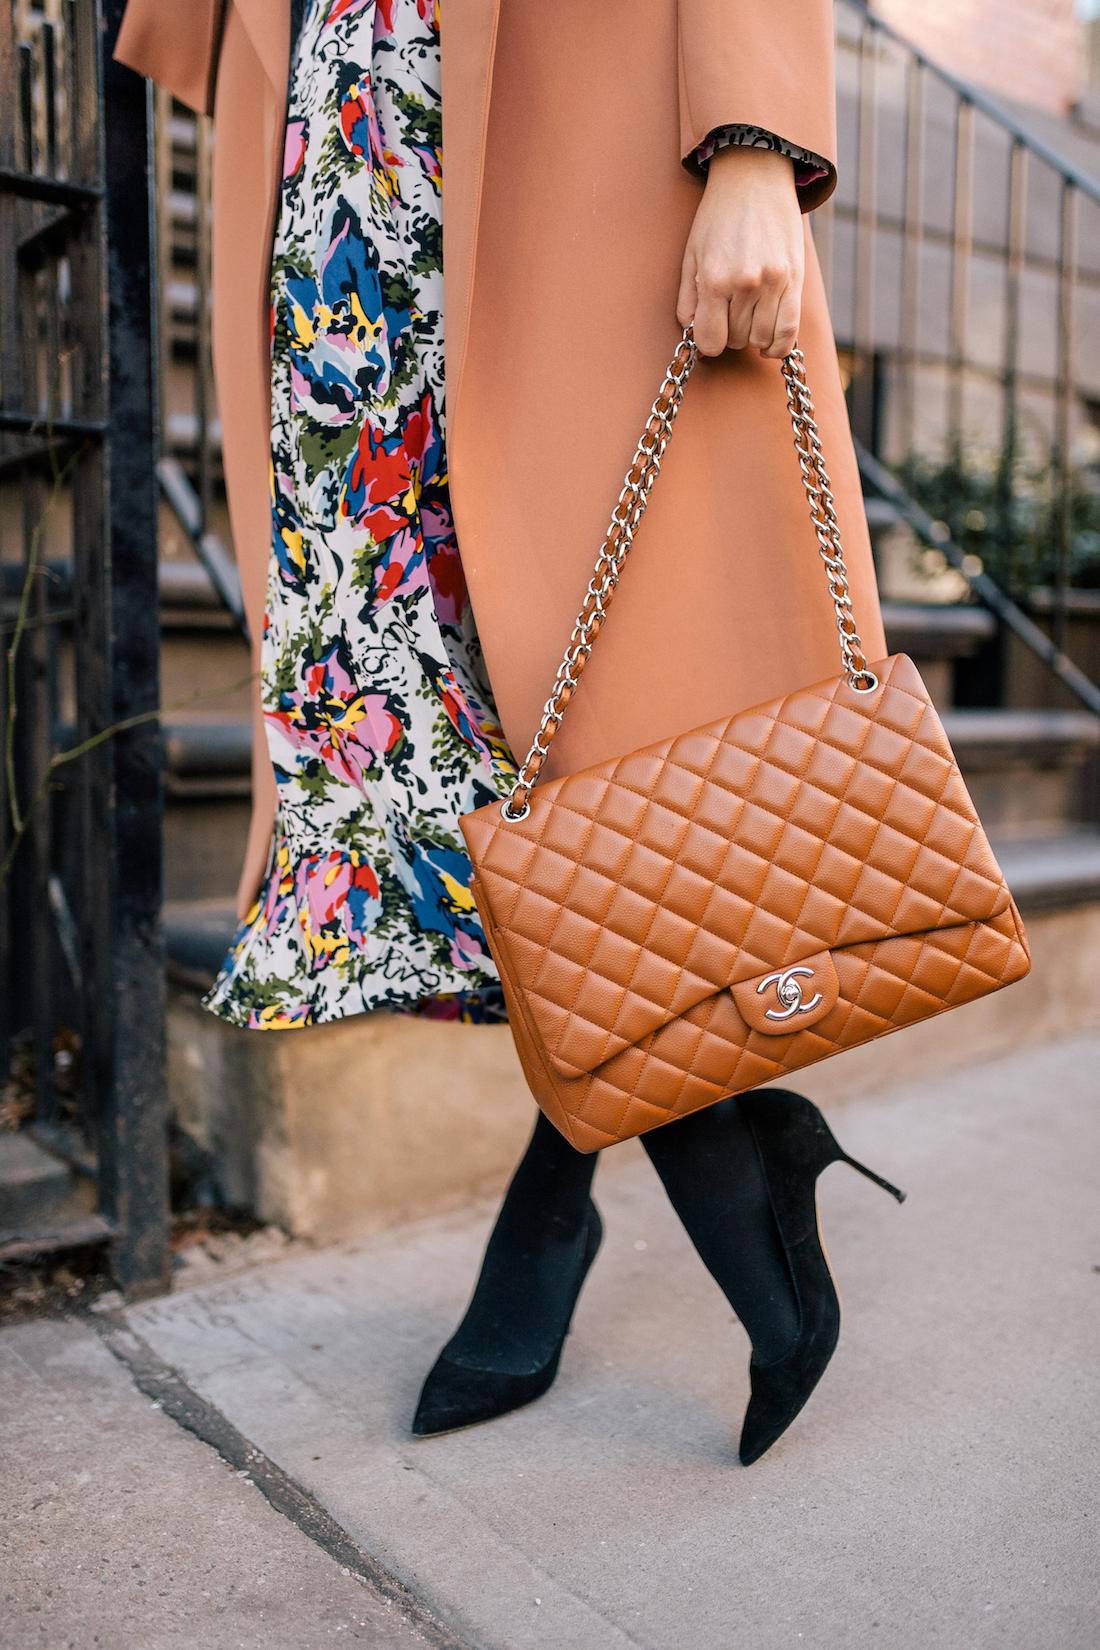 Grace Atwwod's Outfit Details: Malene Birger Coat // Rixo Floral Dress // Express Tights // Manolo Blahnik Heels // Chanel Purse